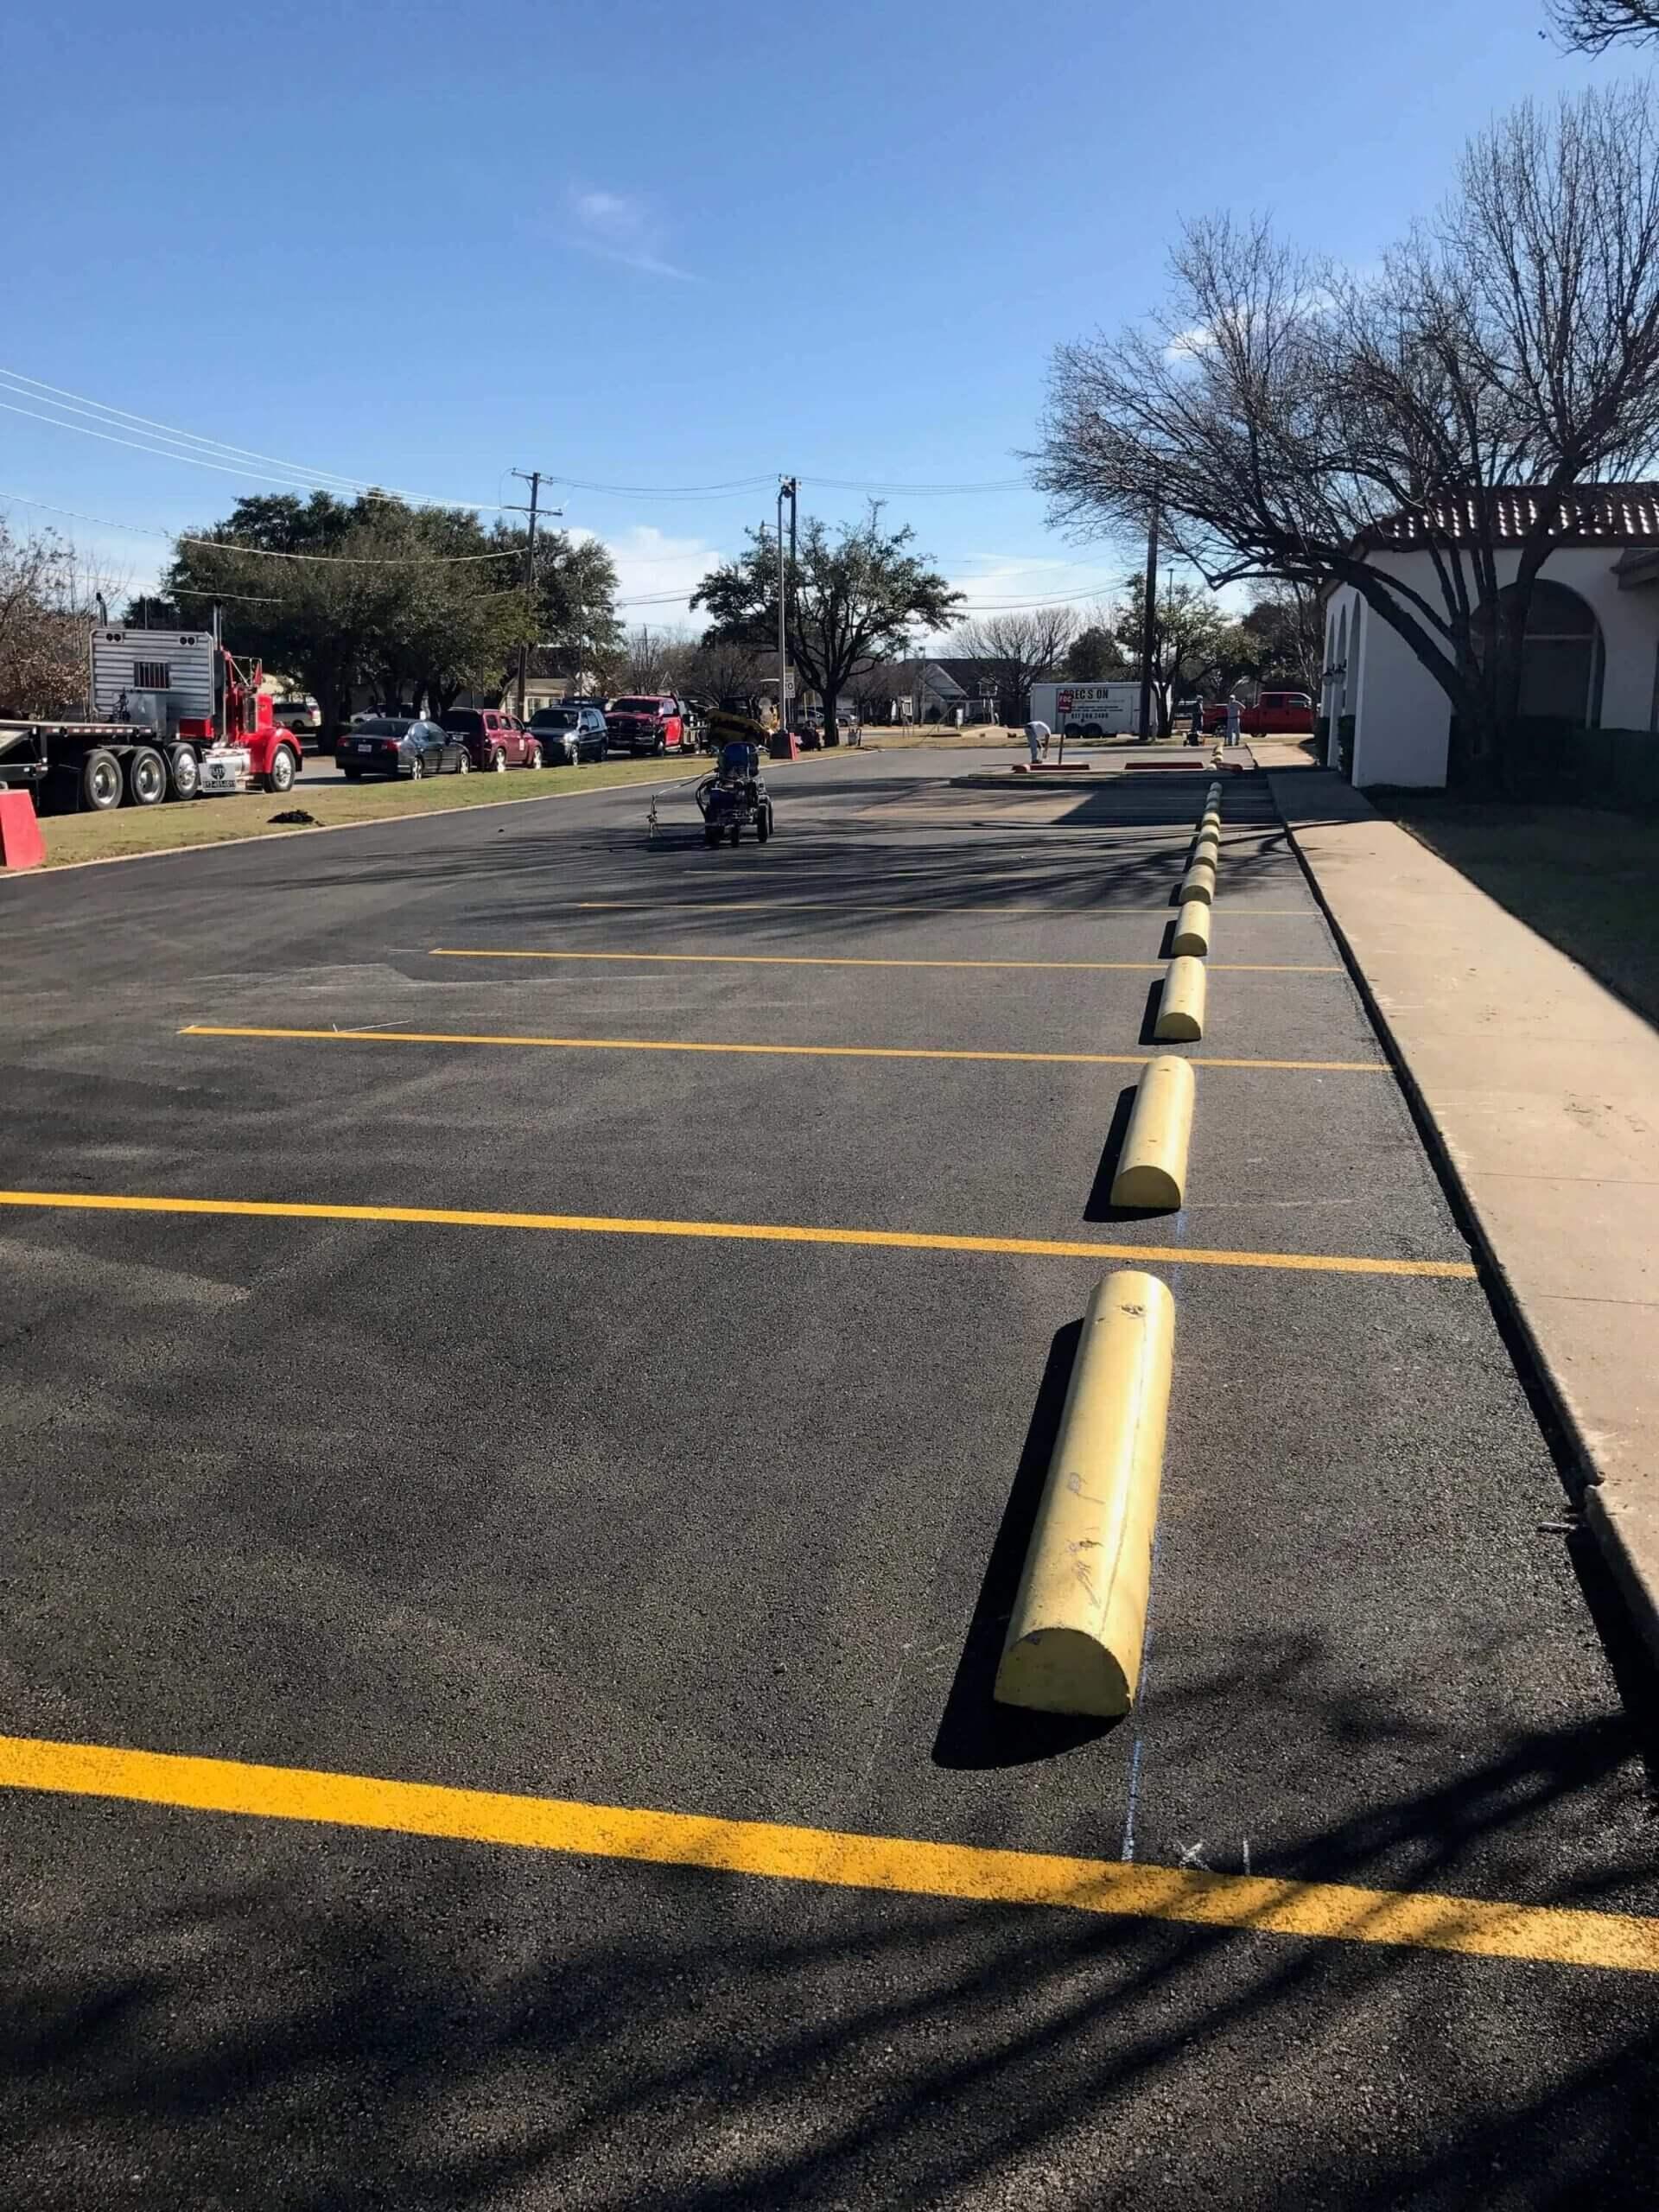 St johns catholic church parking lot striping new